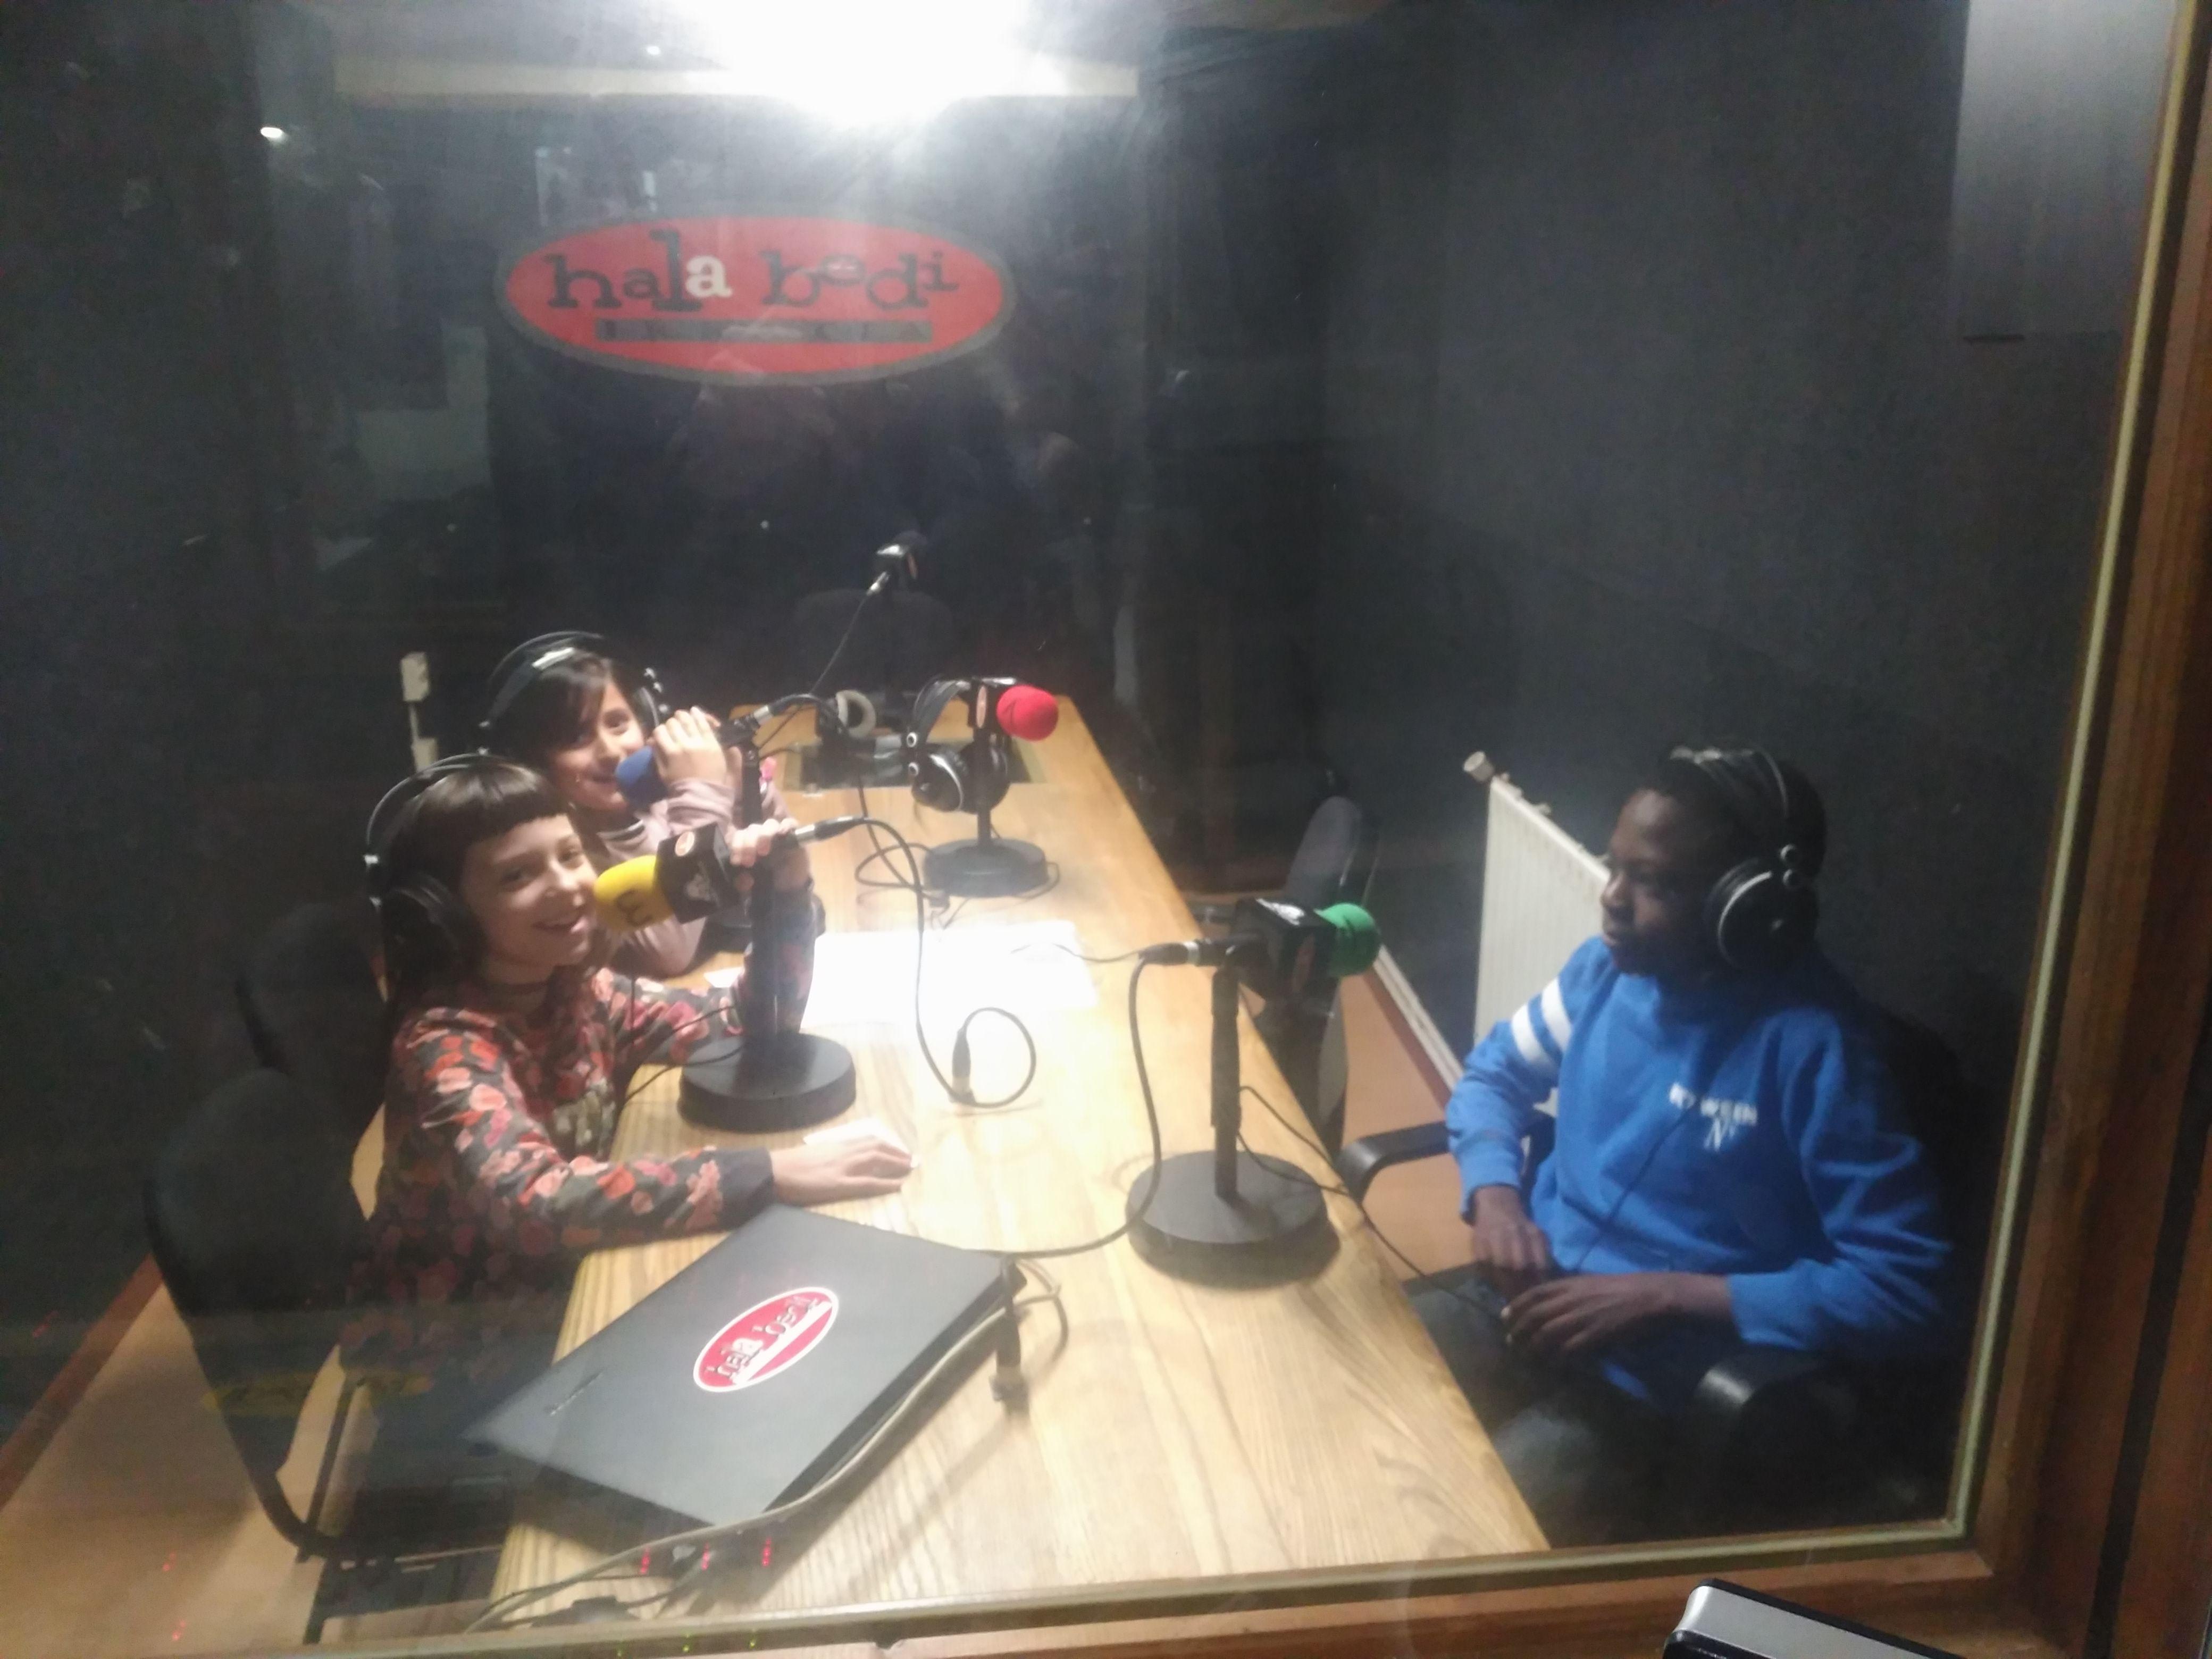 Alai  Bedi:  Maddi,  Uxue  L.  eta  Oladapo